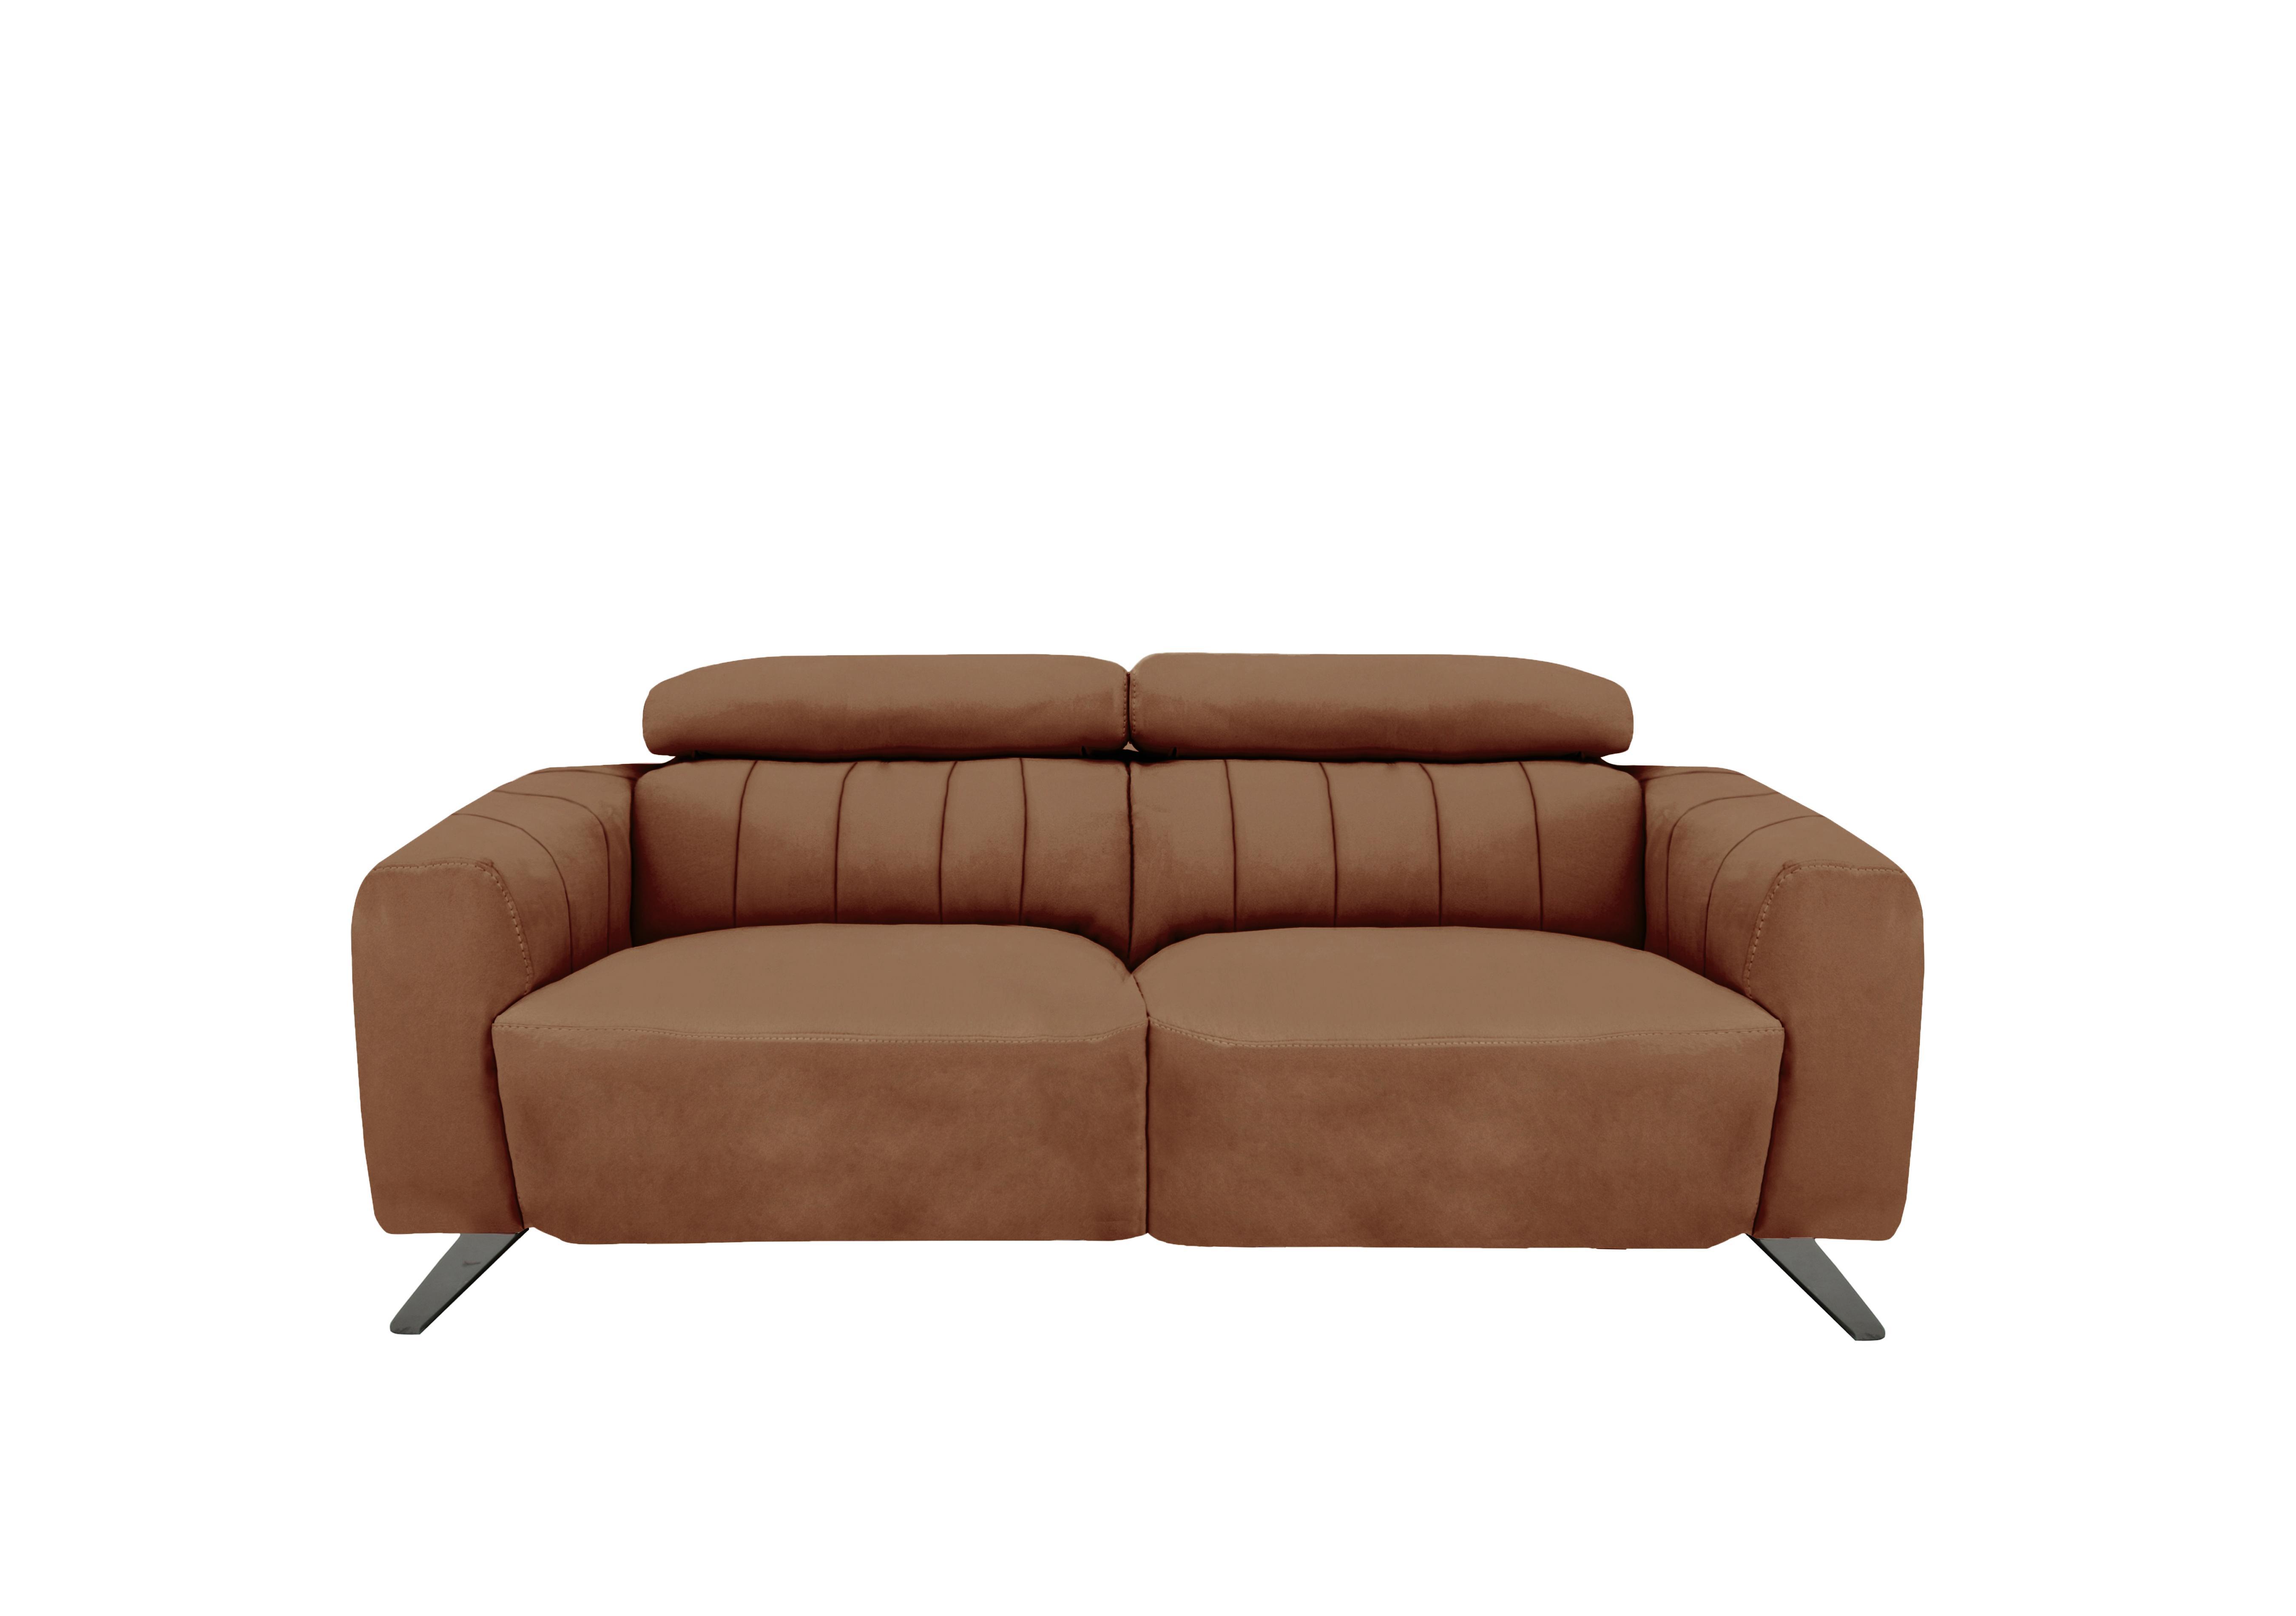 sofasworld showroom paris ultra modern white leather sectional sofa world of fabric sofas furniture village